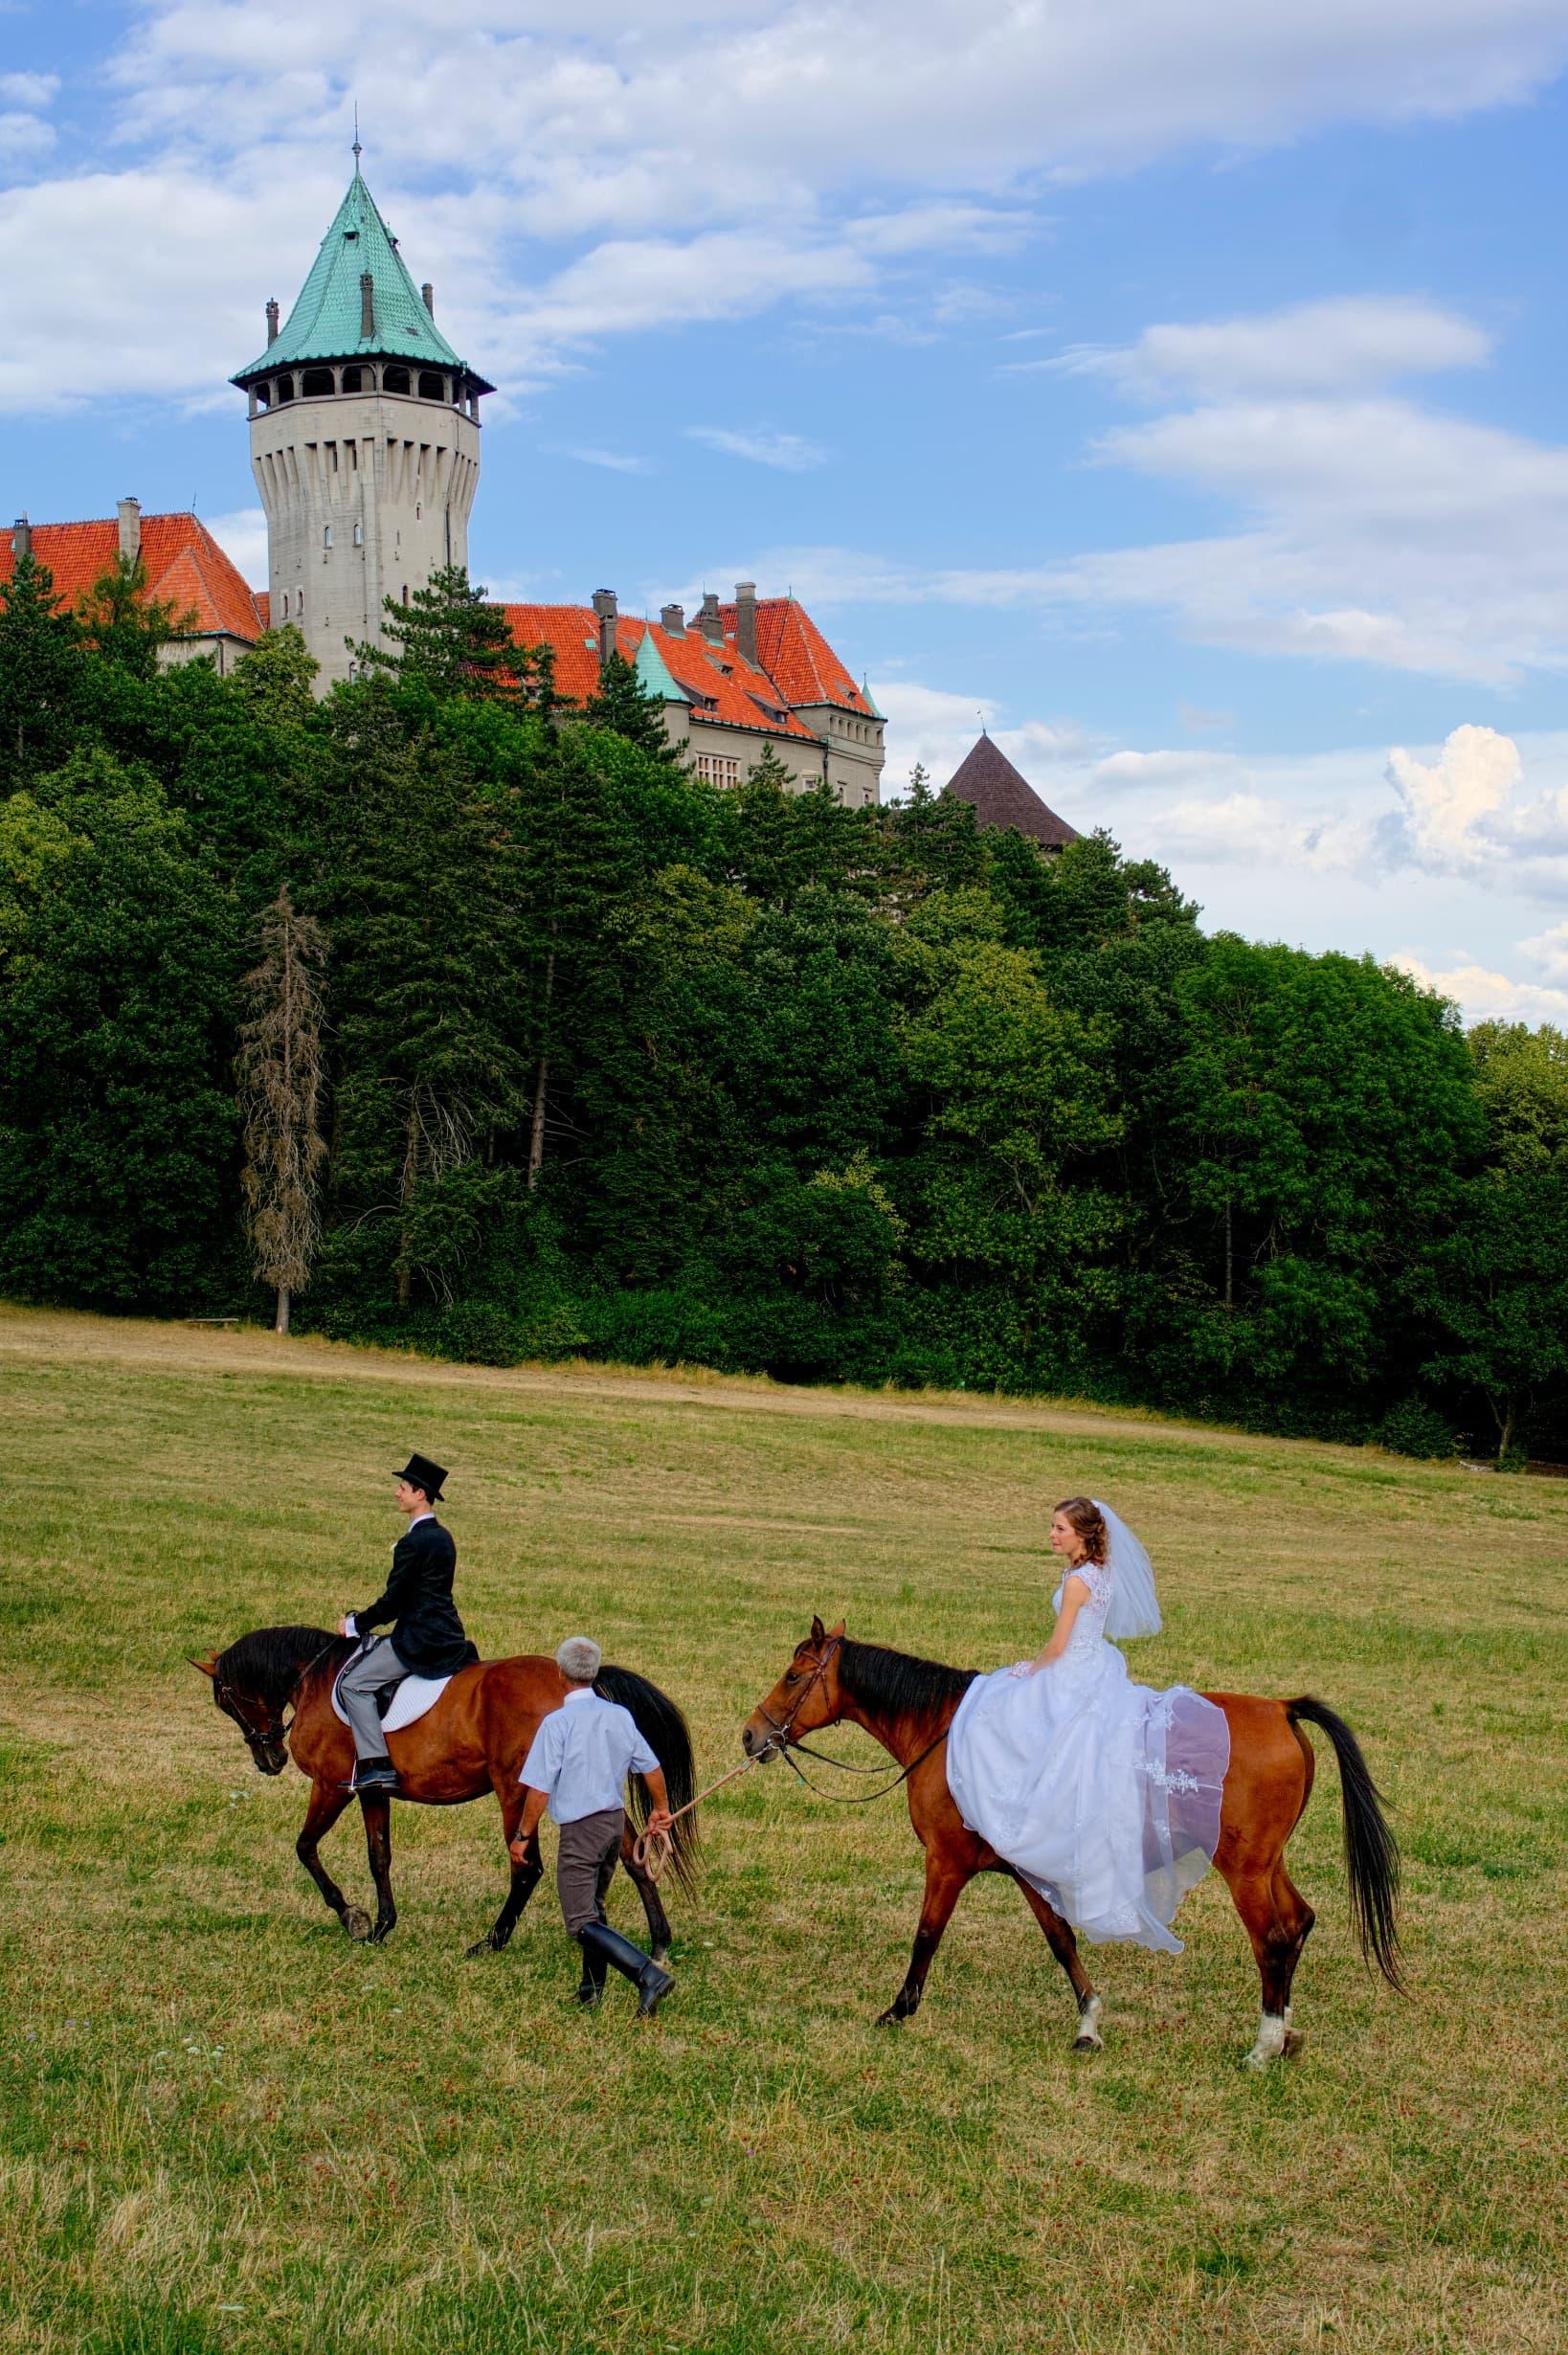 Mato-and-Ivka-before-Smolenice-castle